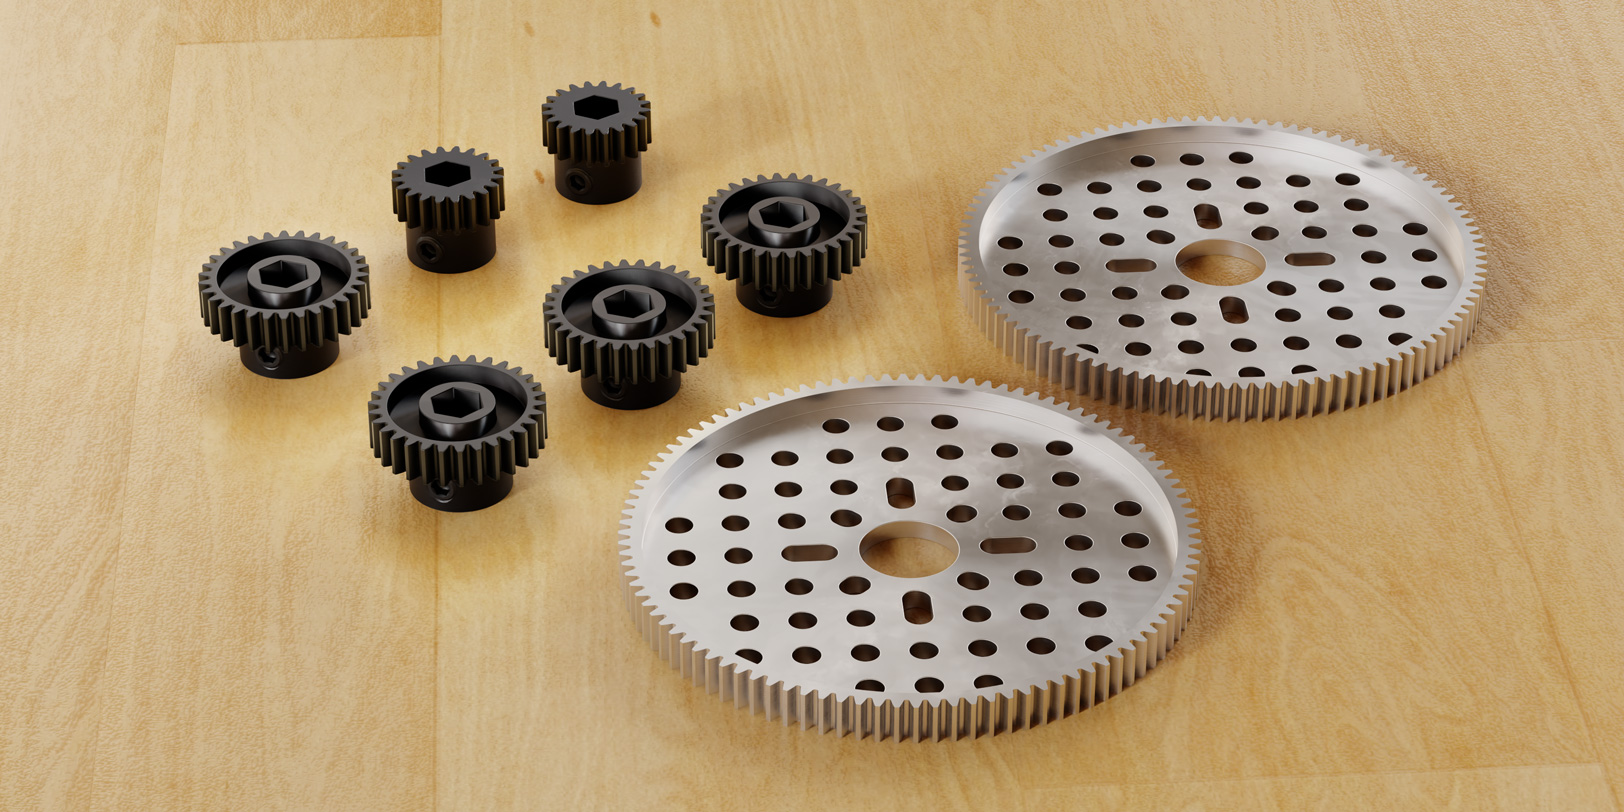 8mm-kit-gears-21-kit-1624px.jpg